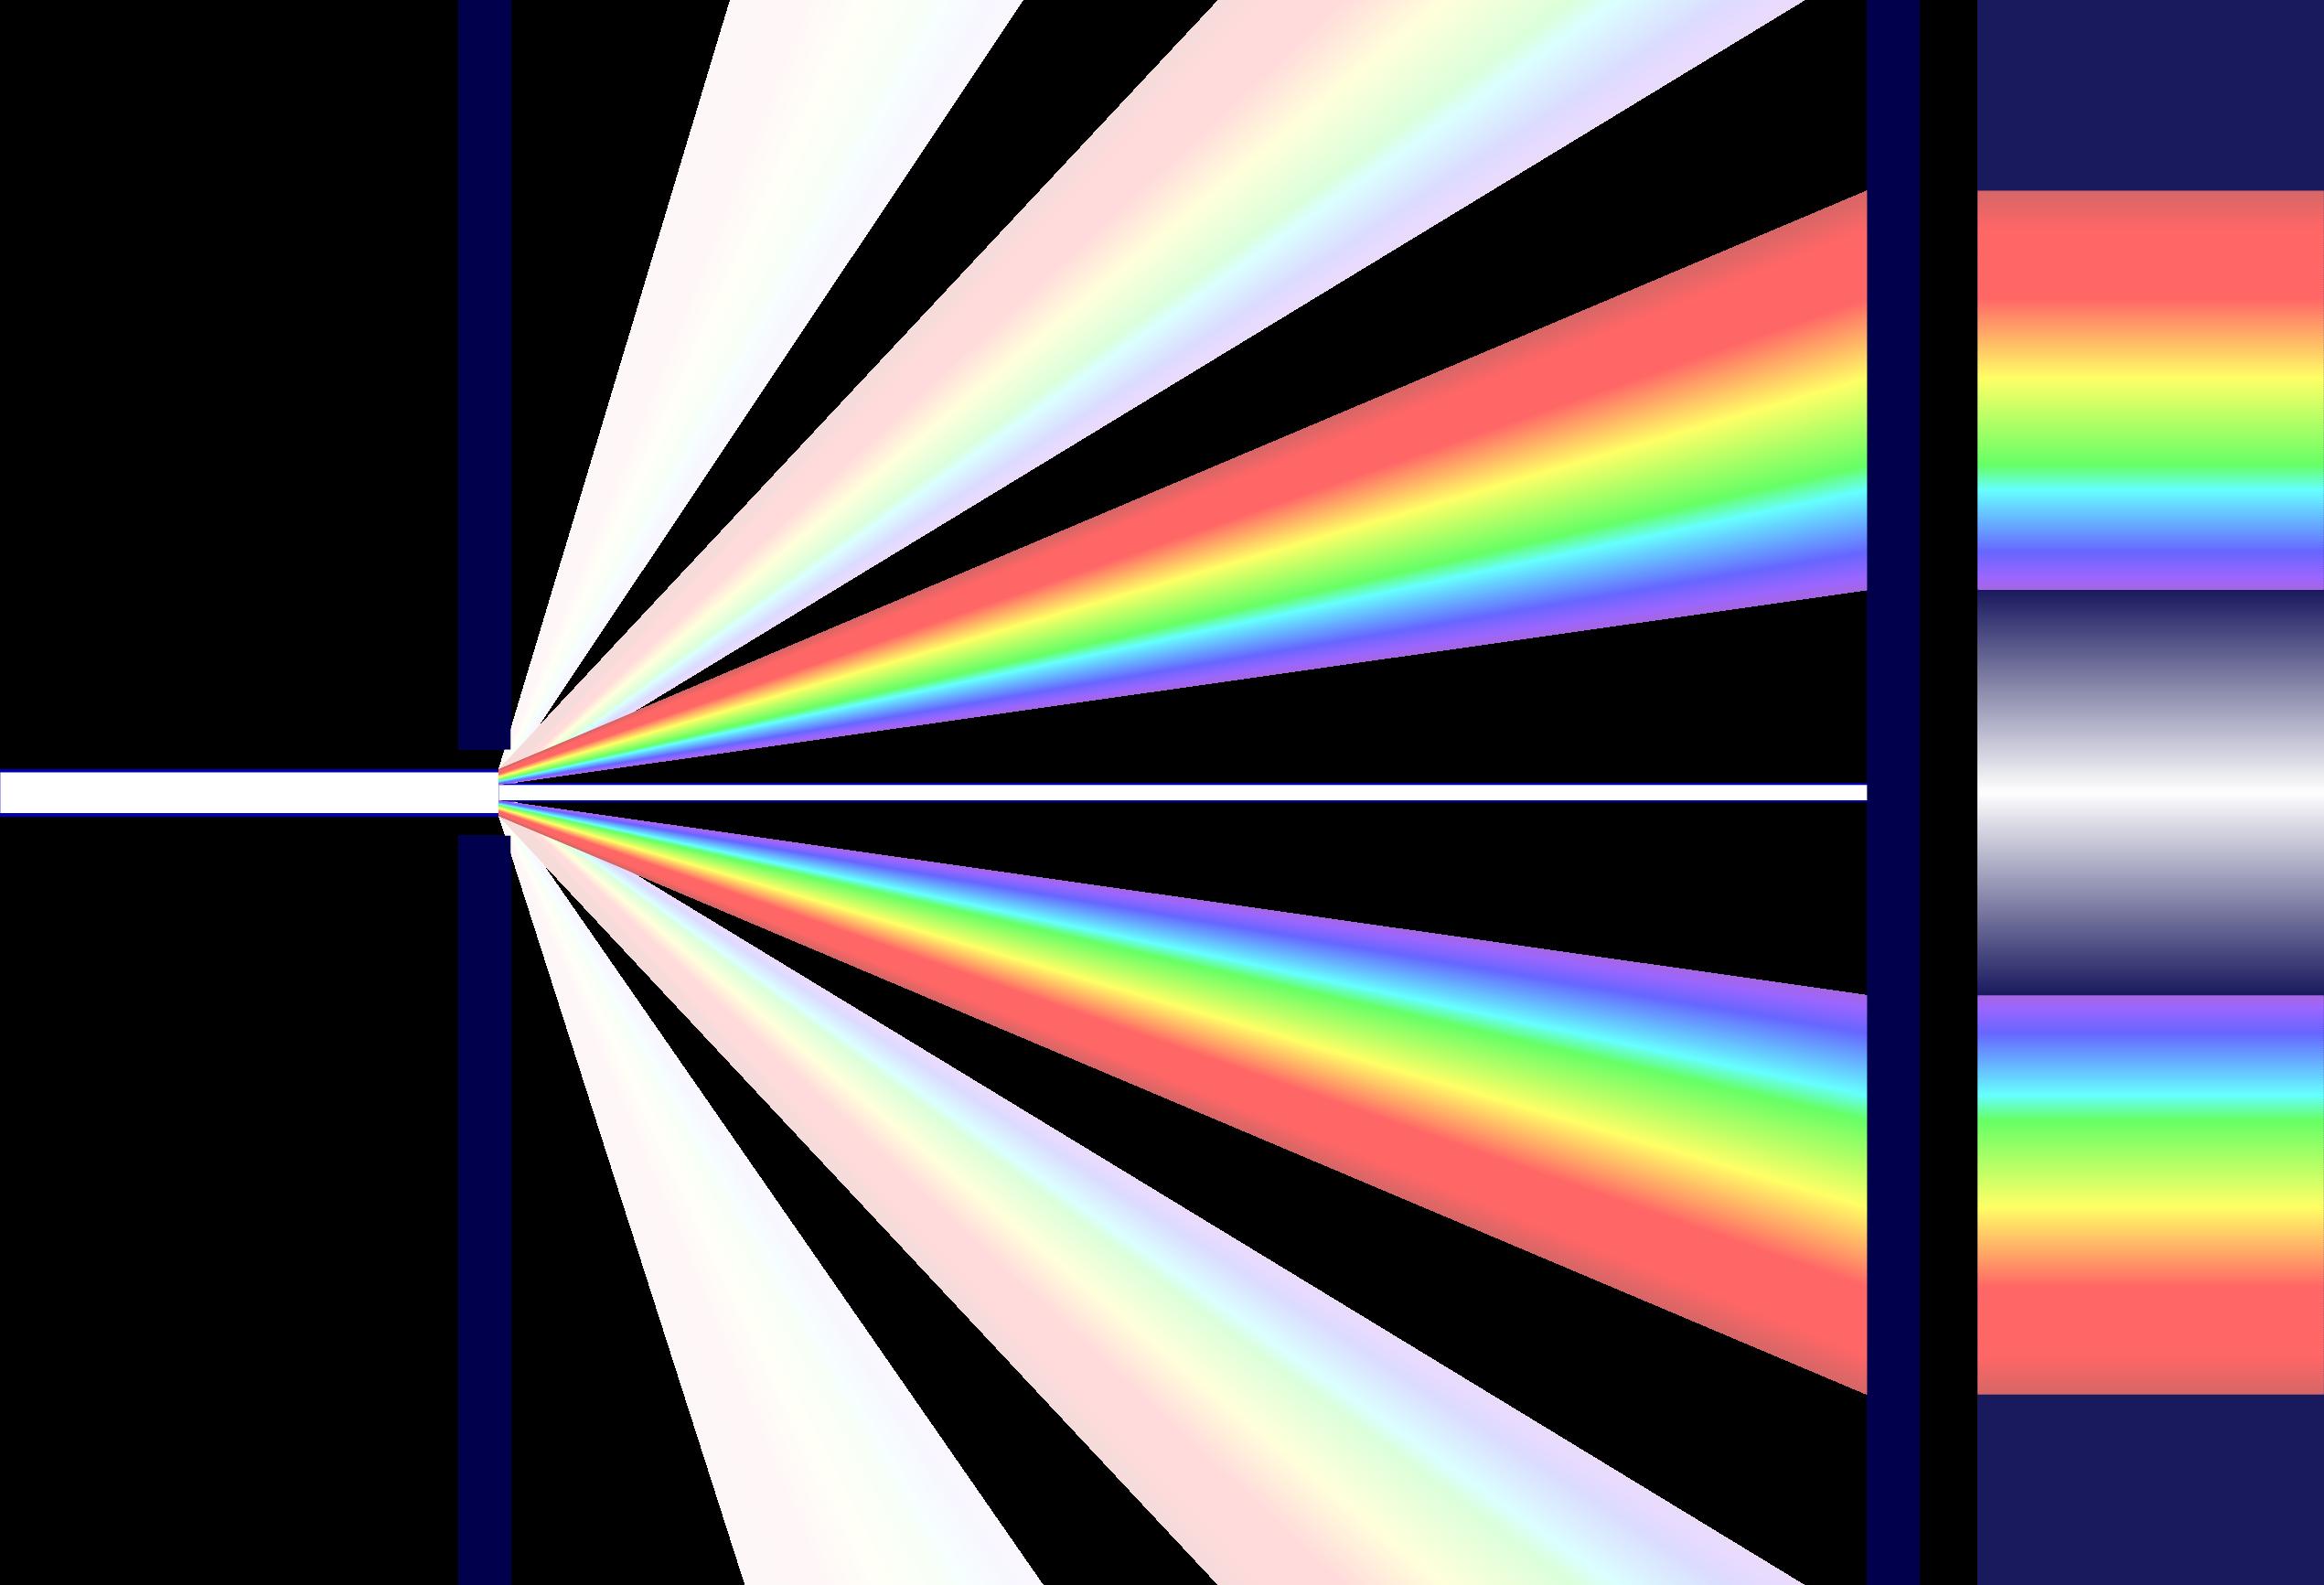 optics_diffraction-009.png